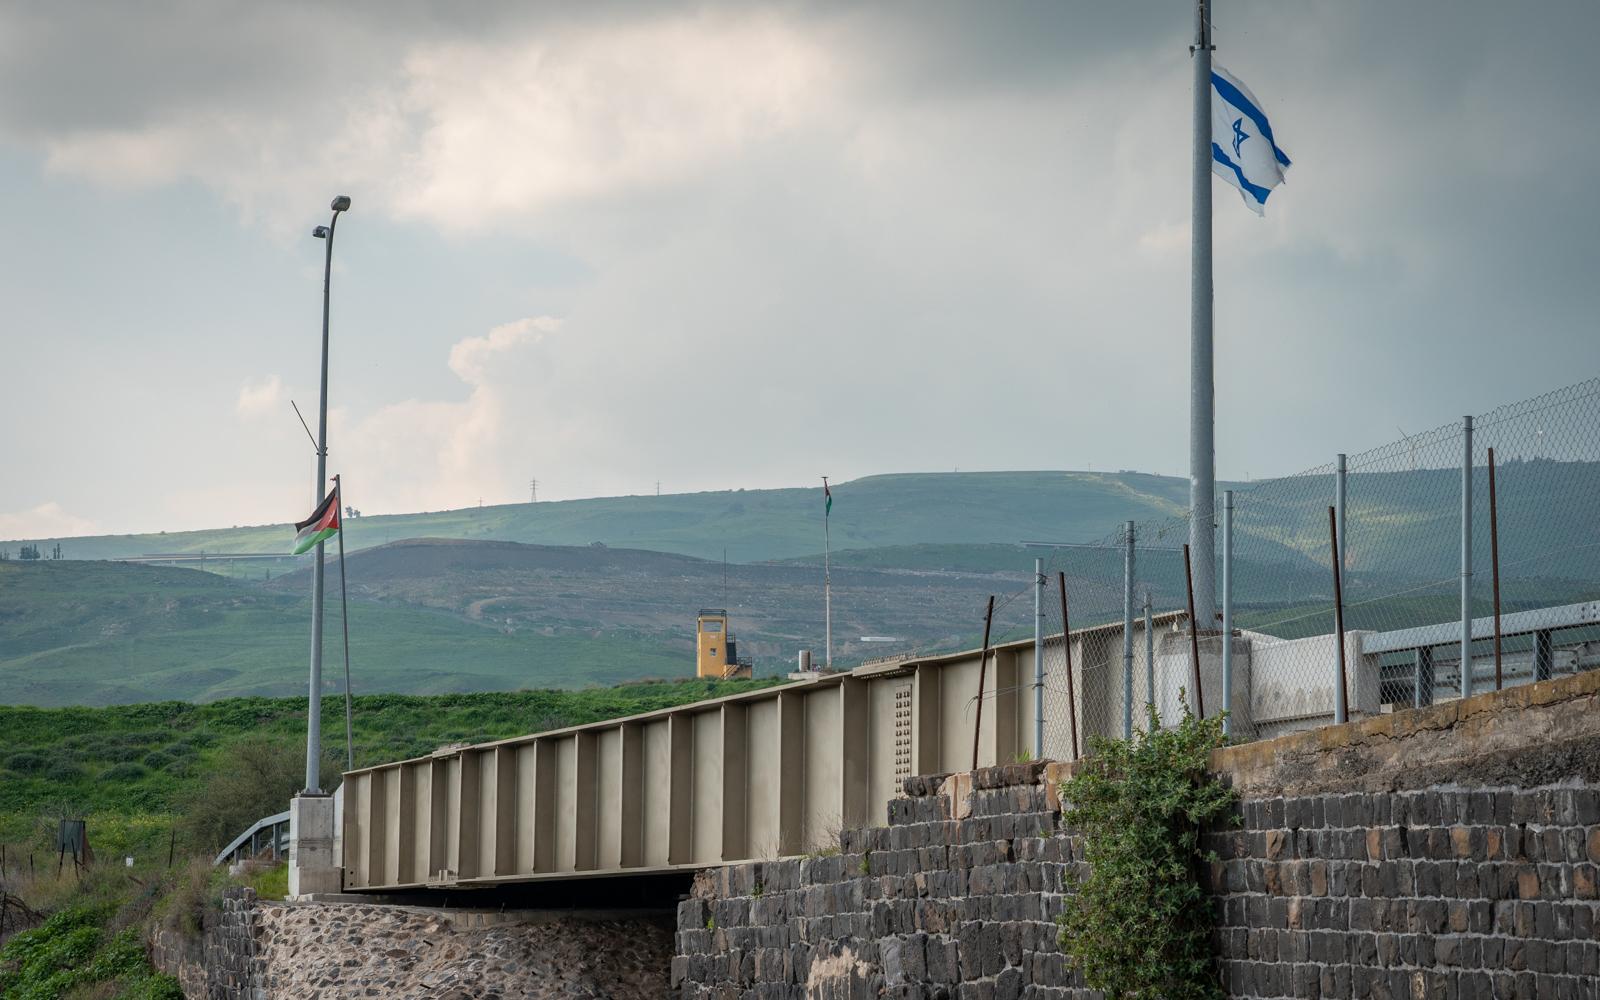 The bridge crossing into the Island of Peace from Israel into Jordan, January 29, 2019. (Luke Tress/Times of Israel)